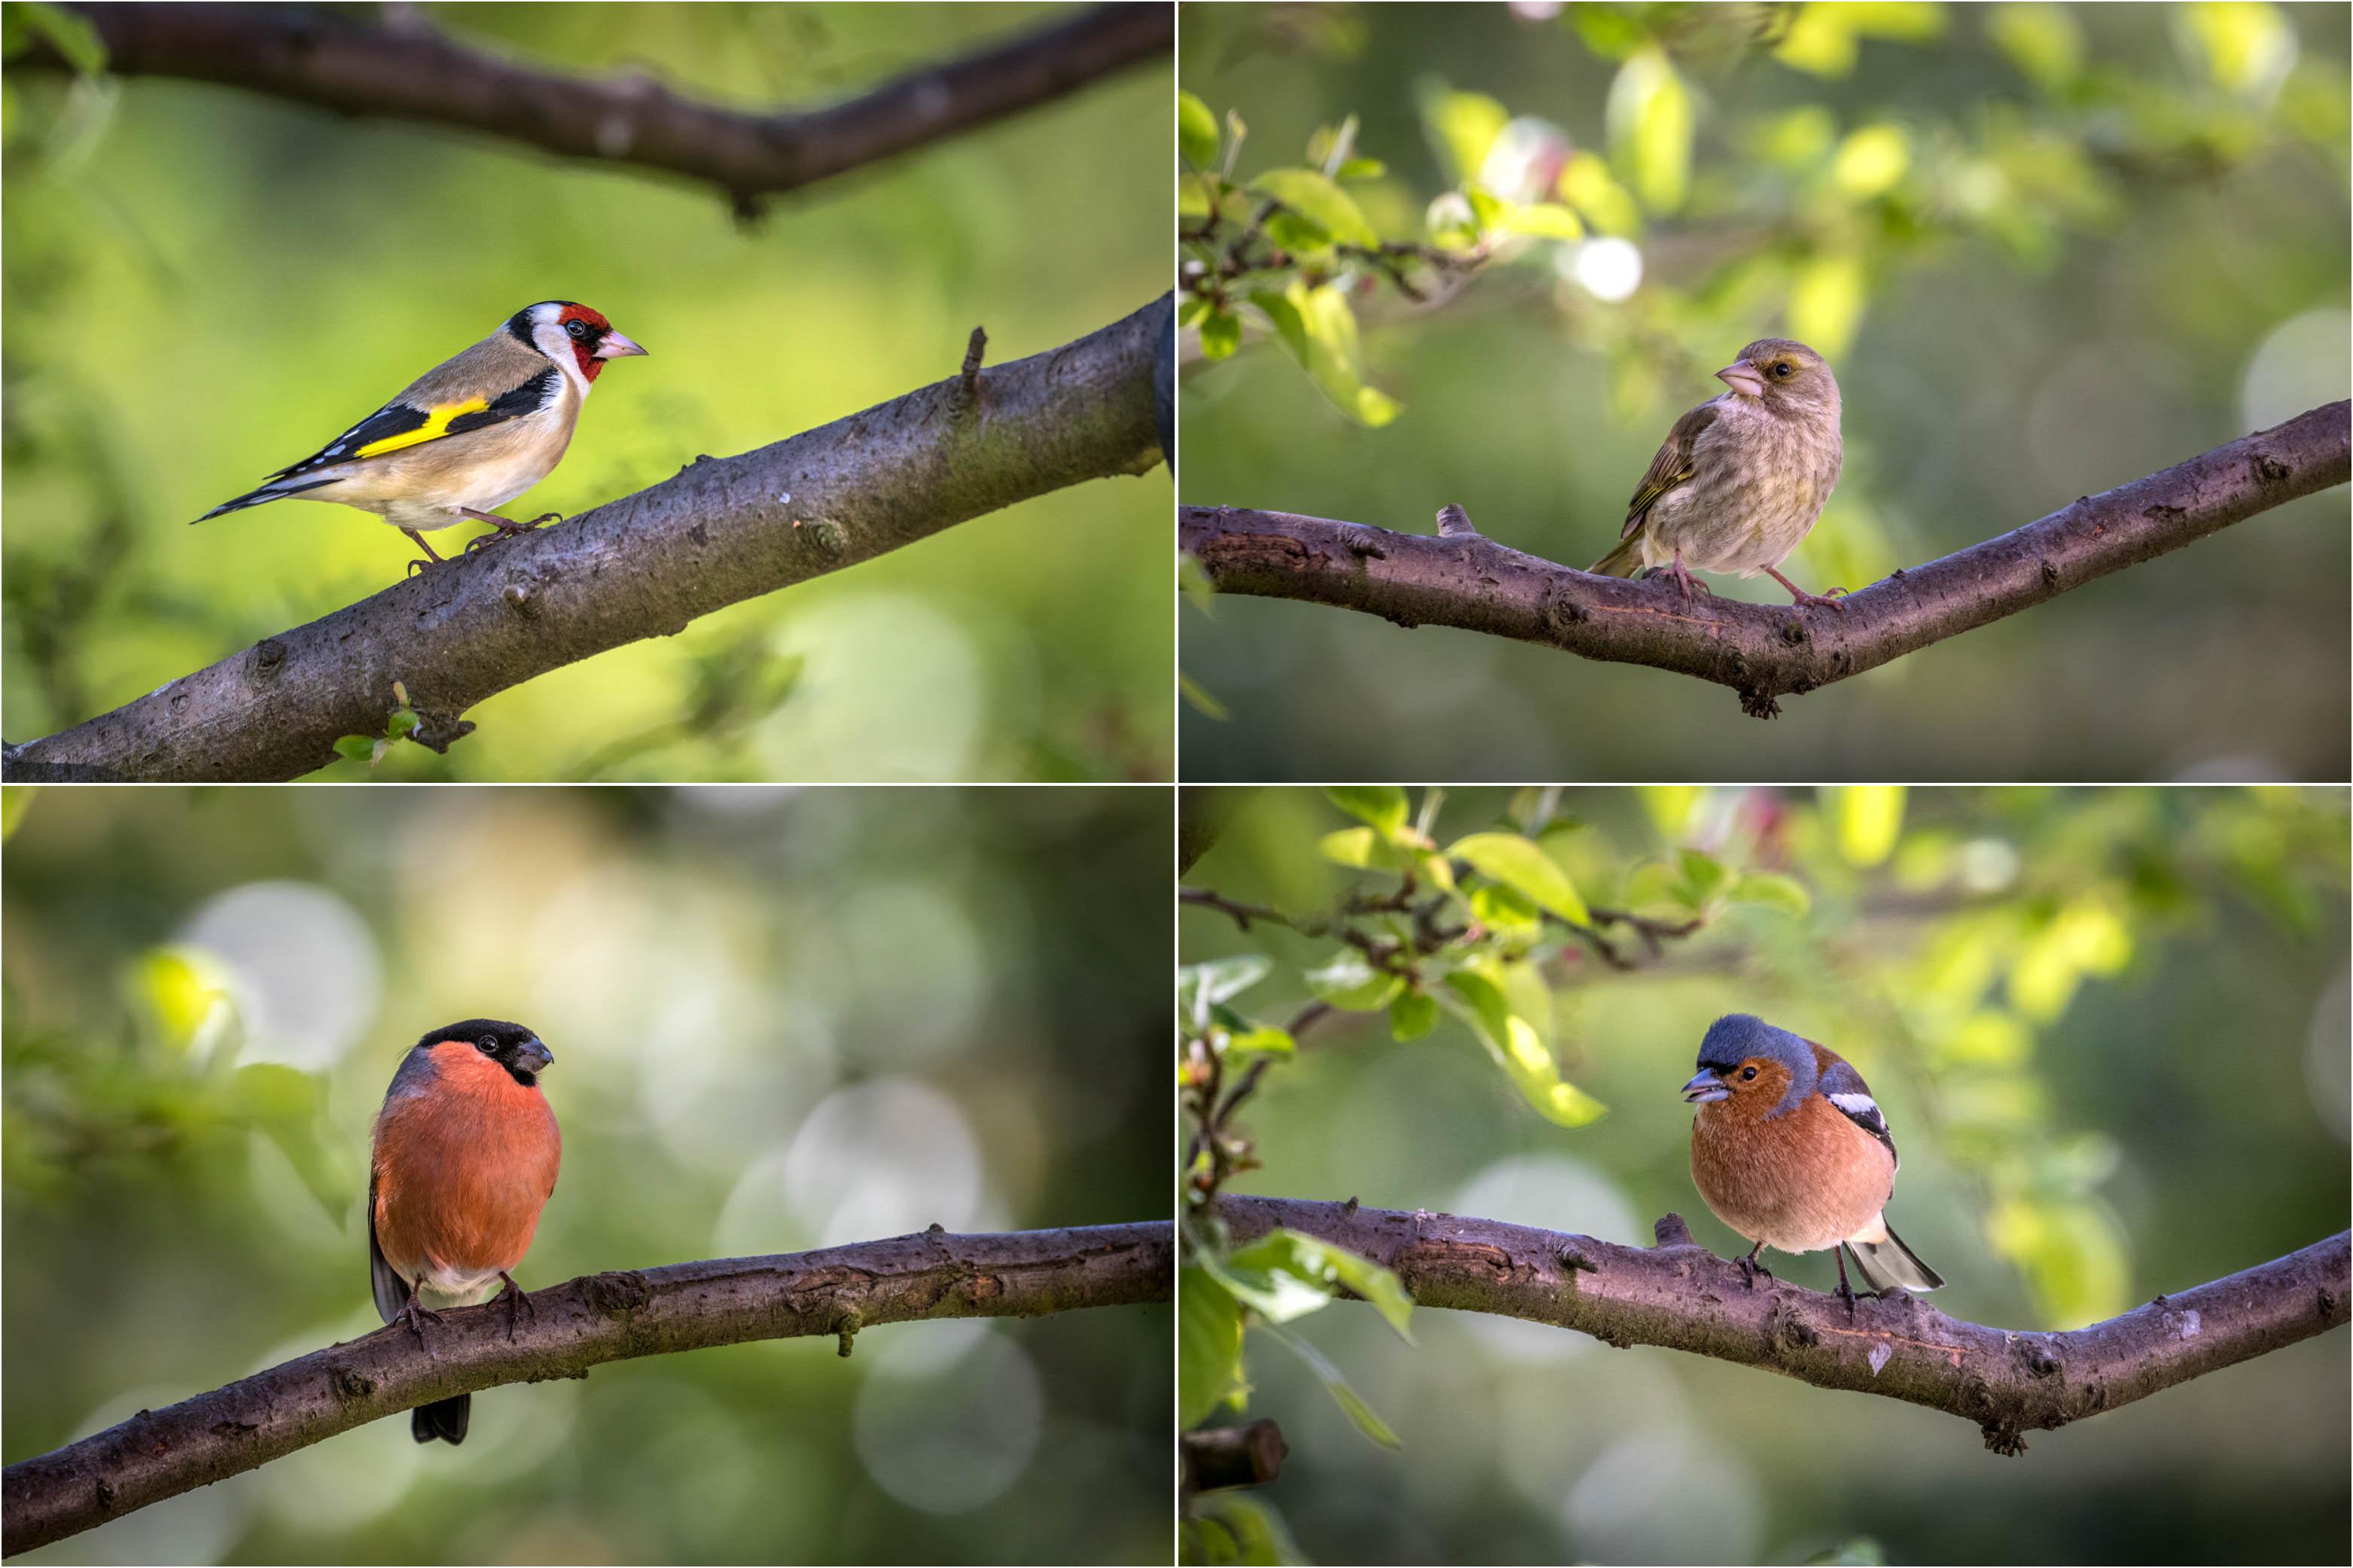 Goldfinch, greenfinch, bullfinch and chaffinch